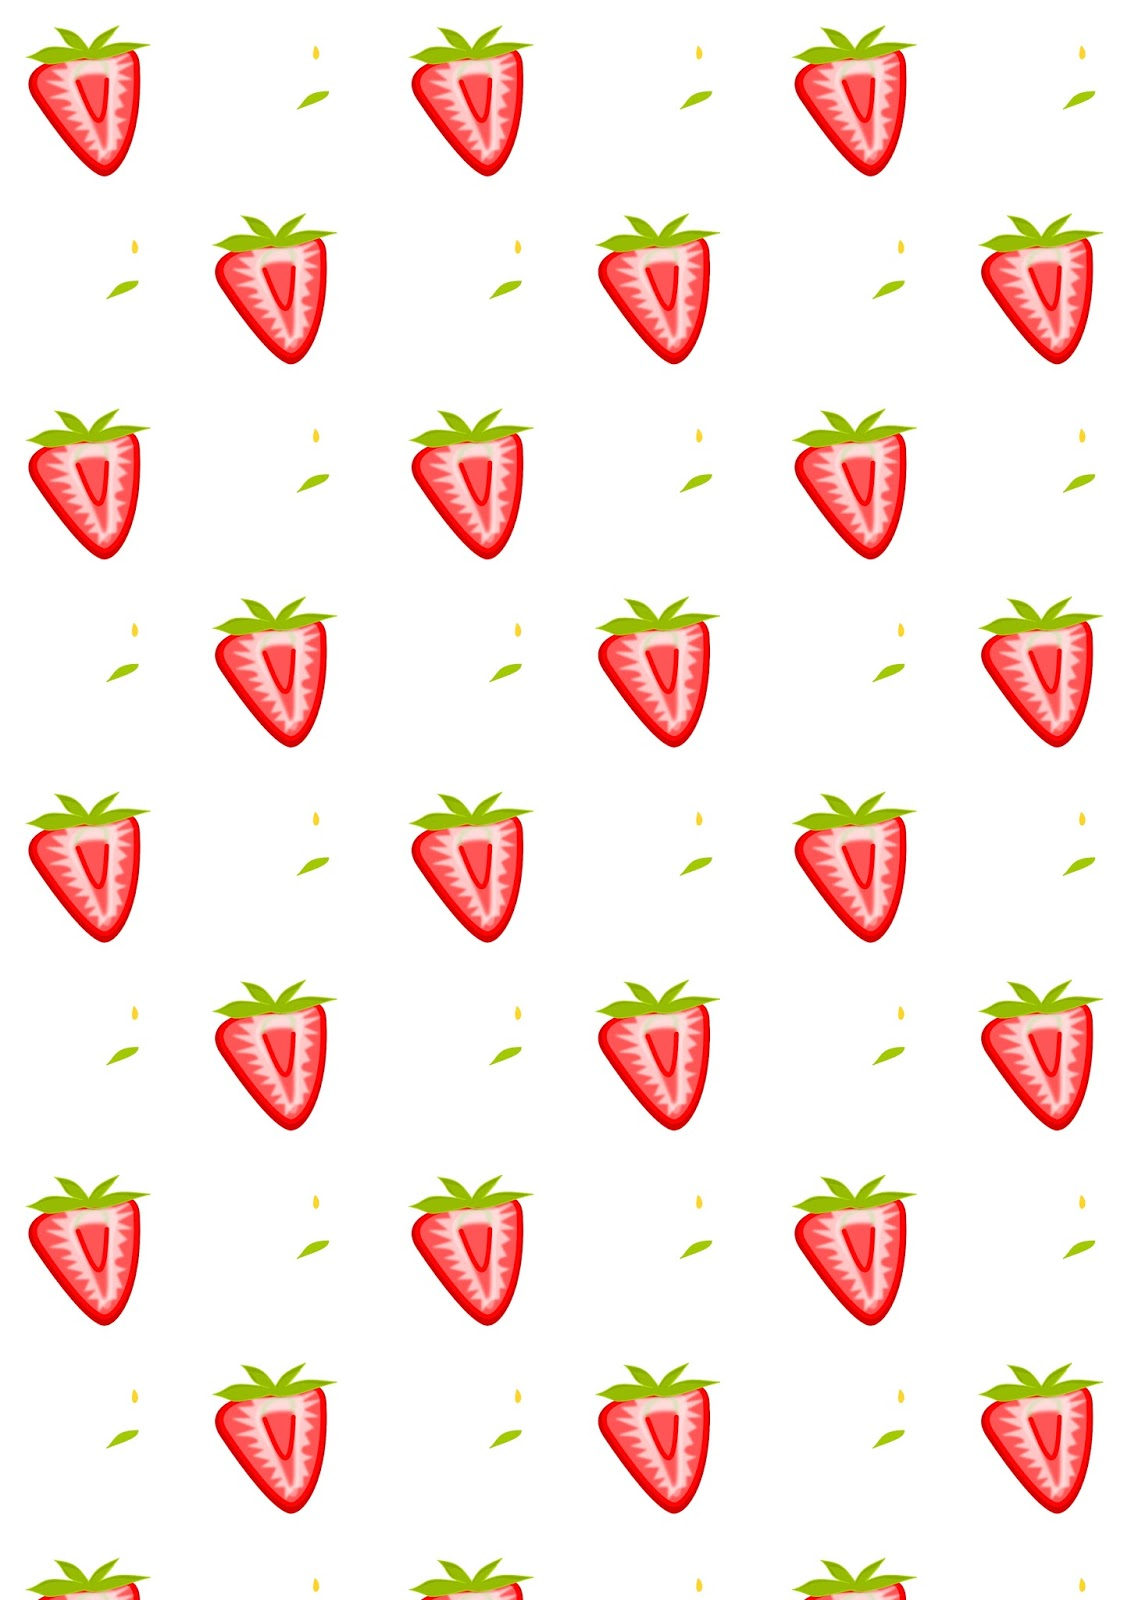 free digital strawberry scrapbooking paper ausdruckbares geschenkpapier freebie meinlilapark. Black Bedroom Furniture Sets. Home Design Ideas